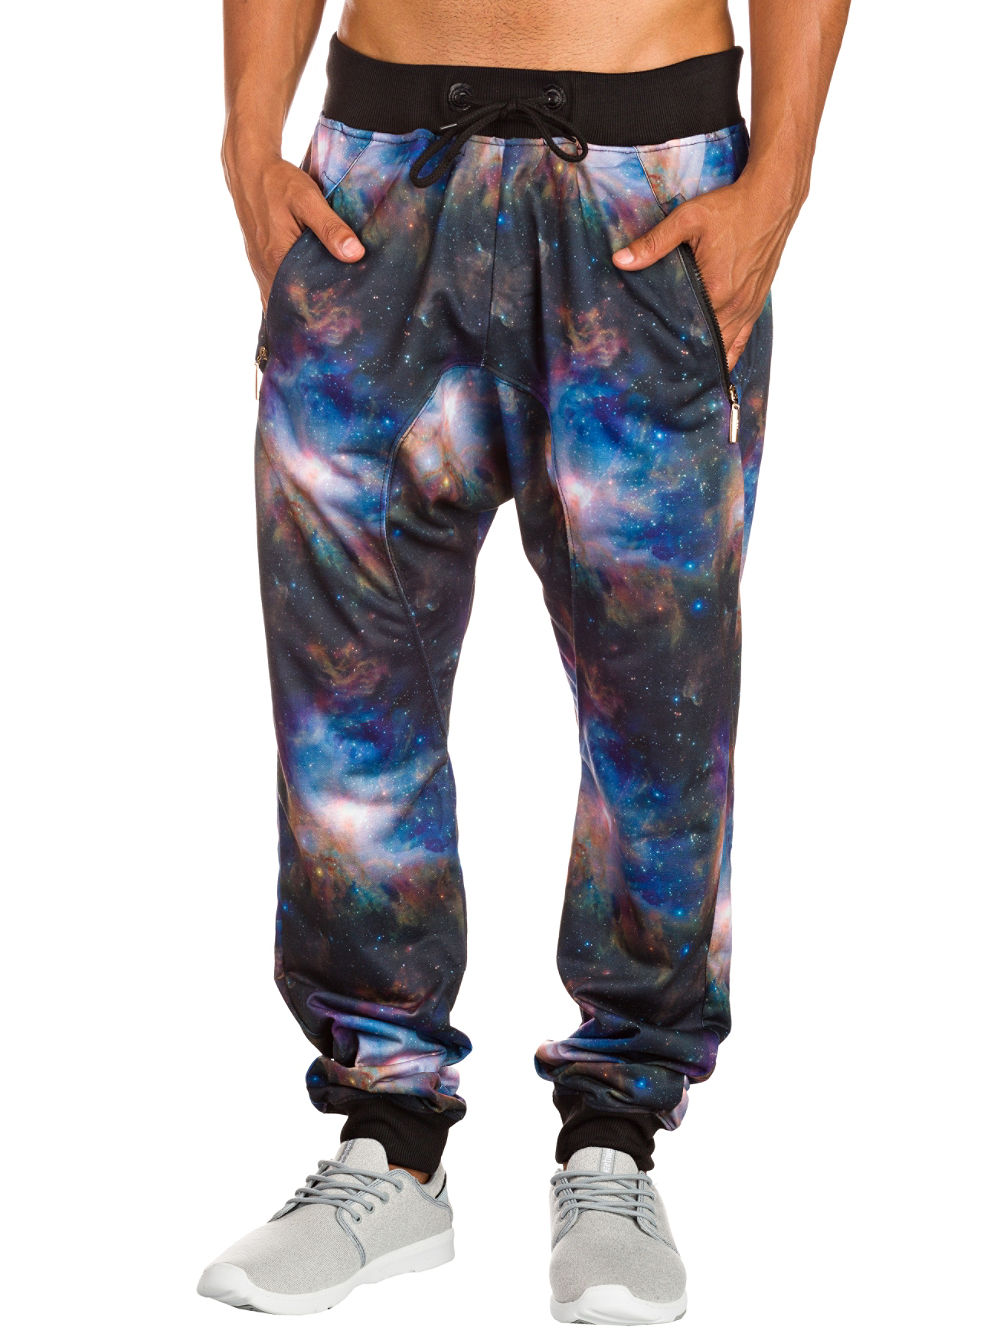 american-stitch-new-galaxy-jogging-pants